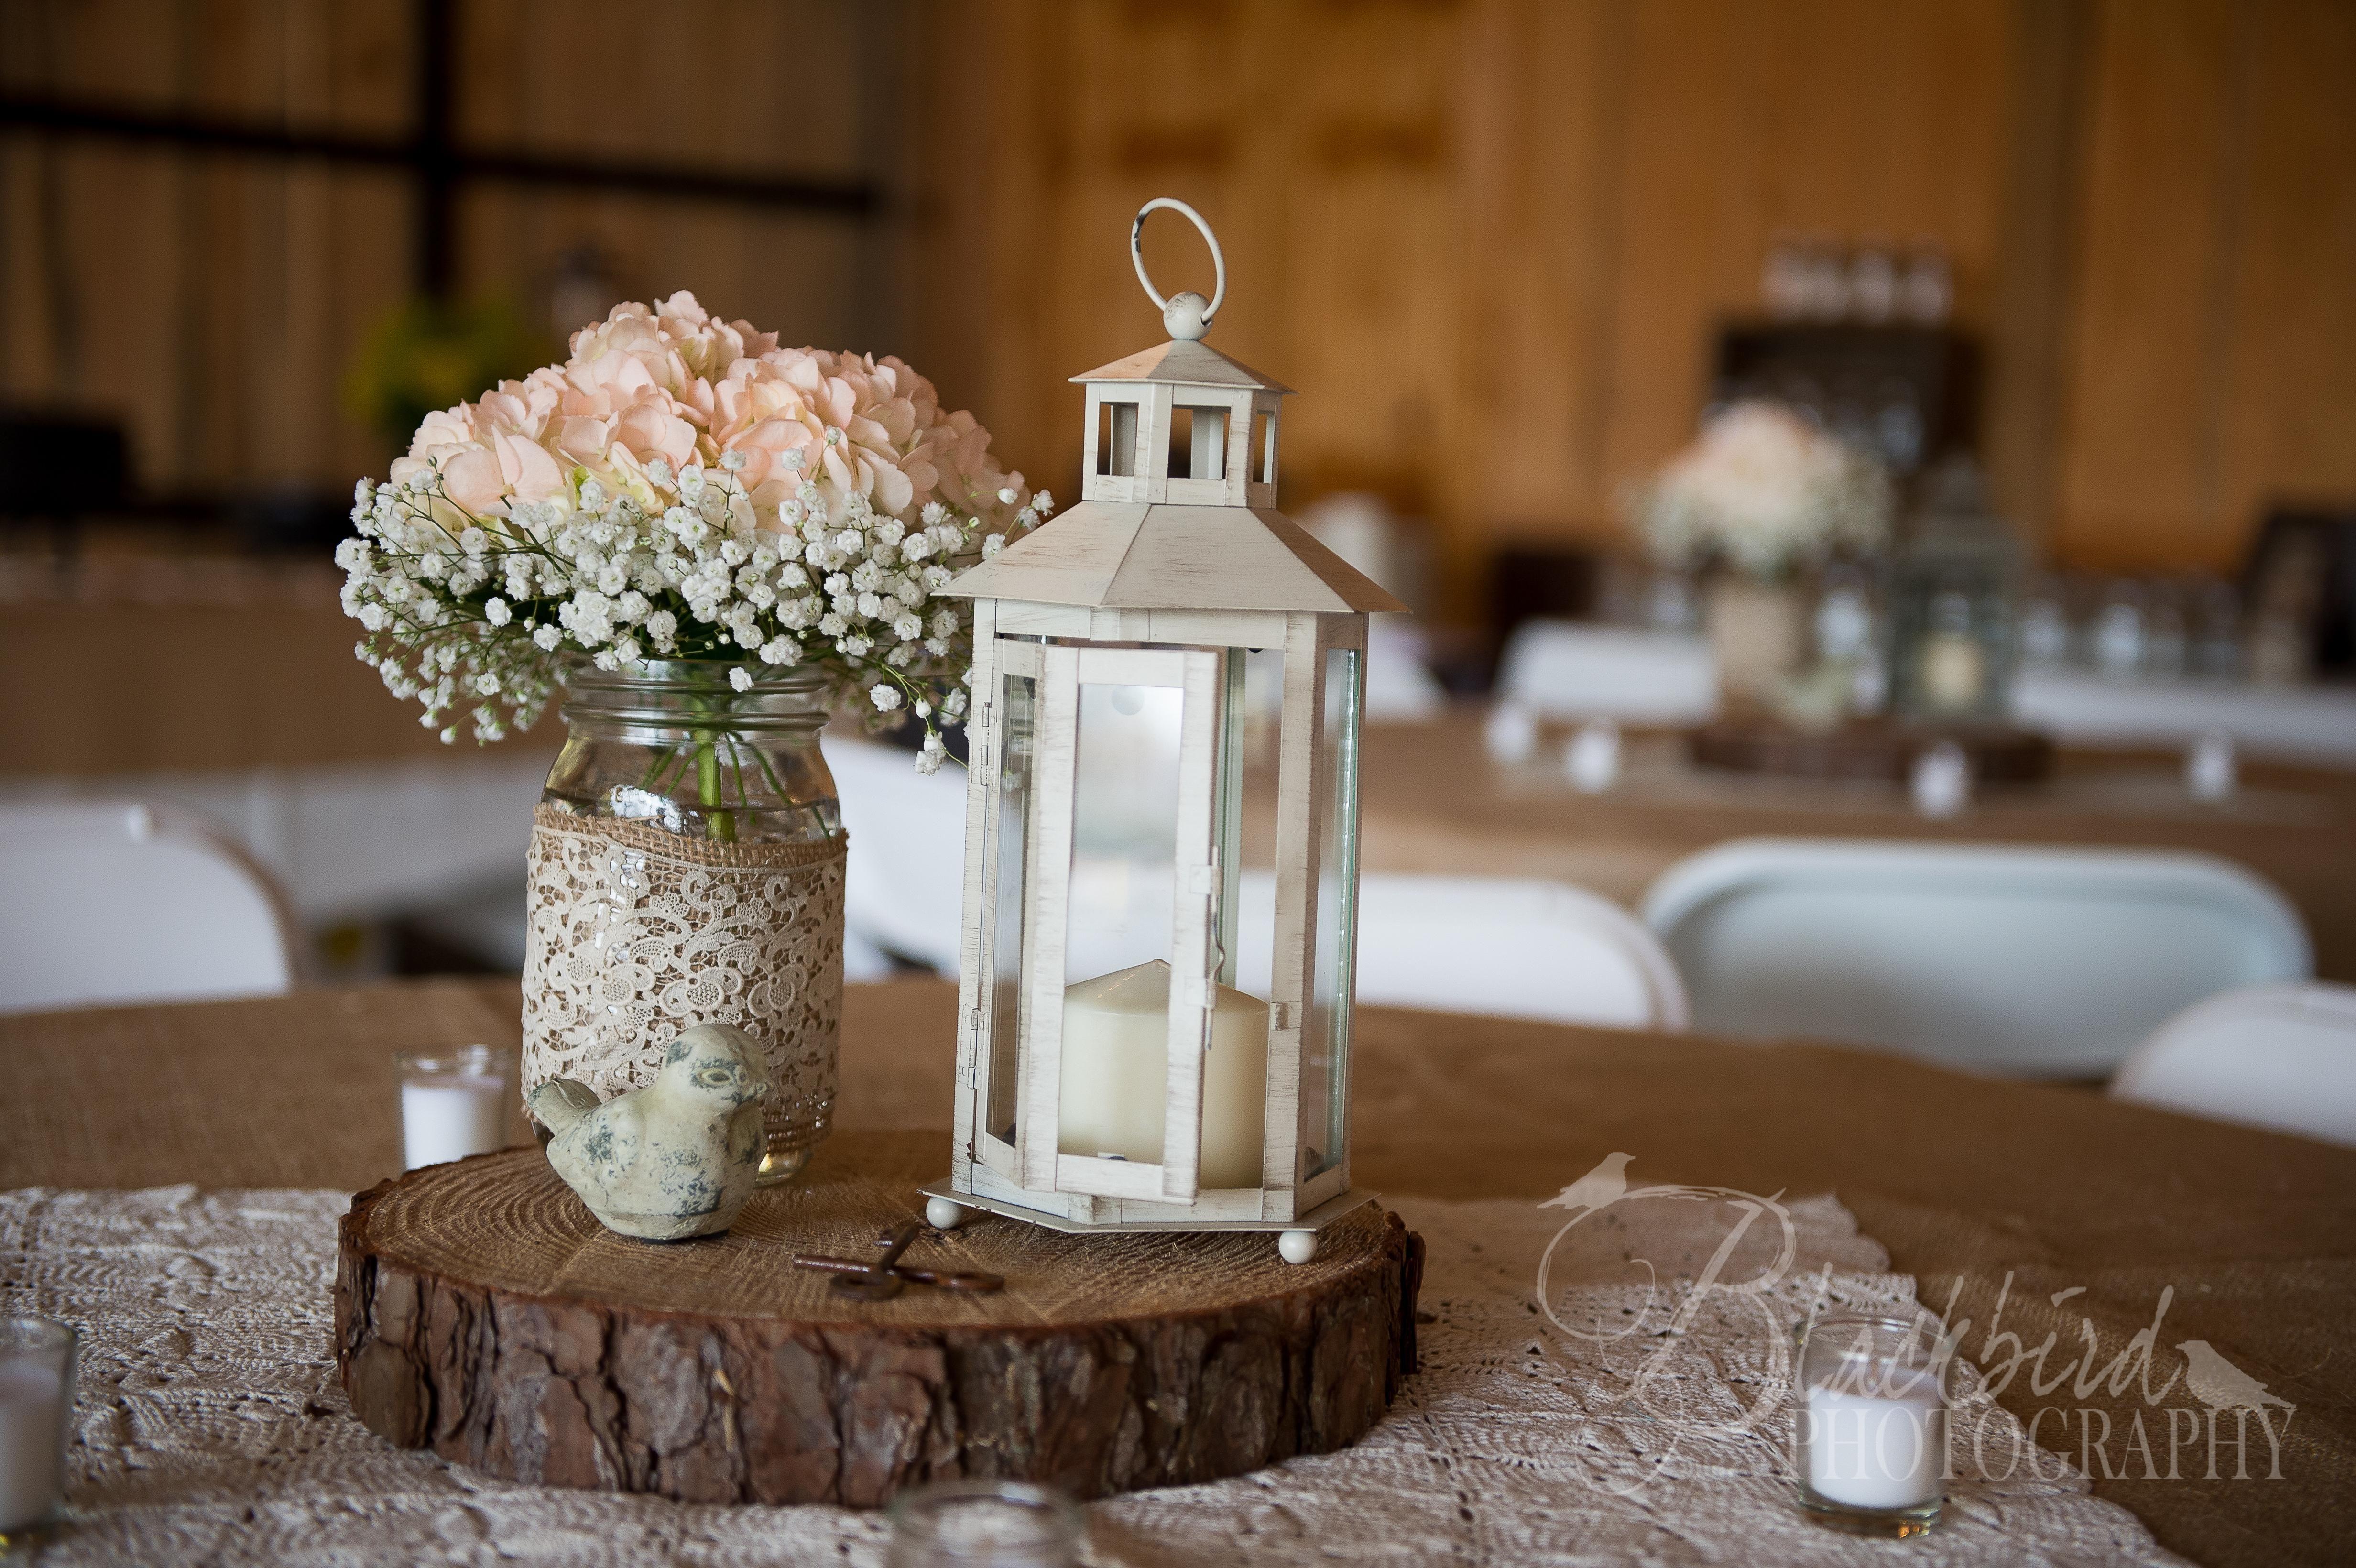 Ball Jar Wedding Decorations Vintage Rustic Wedding Venue Spring Lake Rockmart Ga  Mason Jars